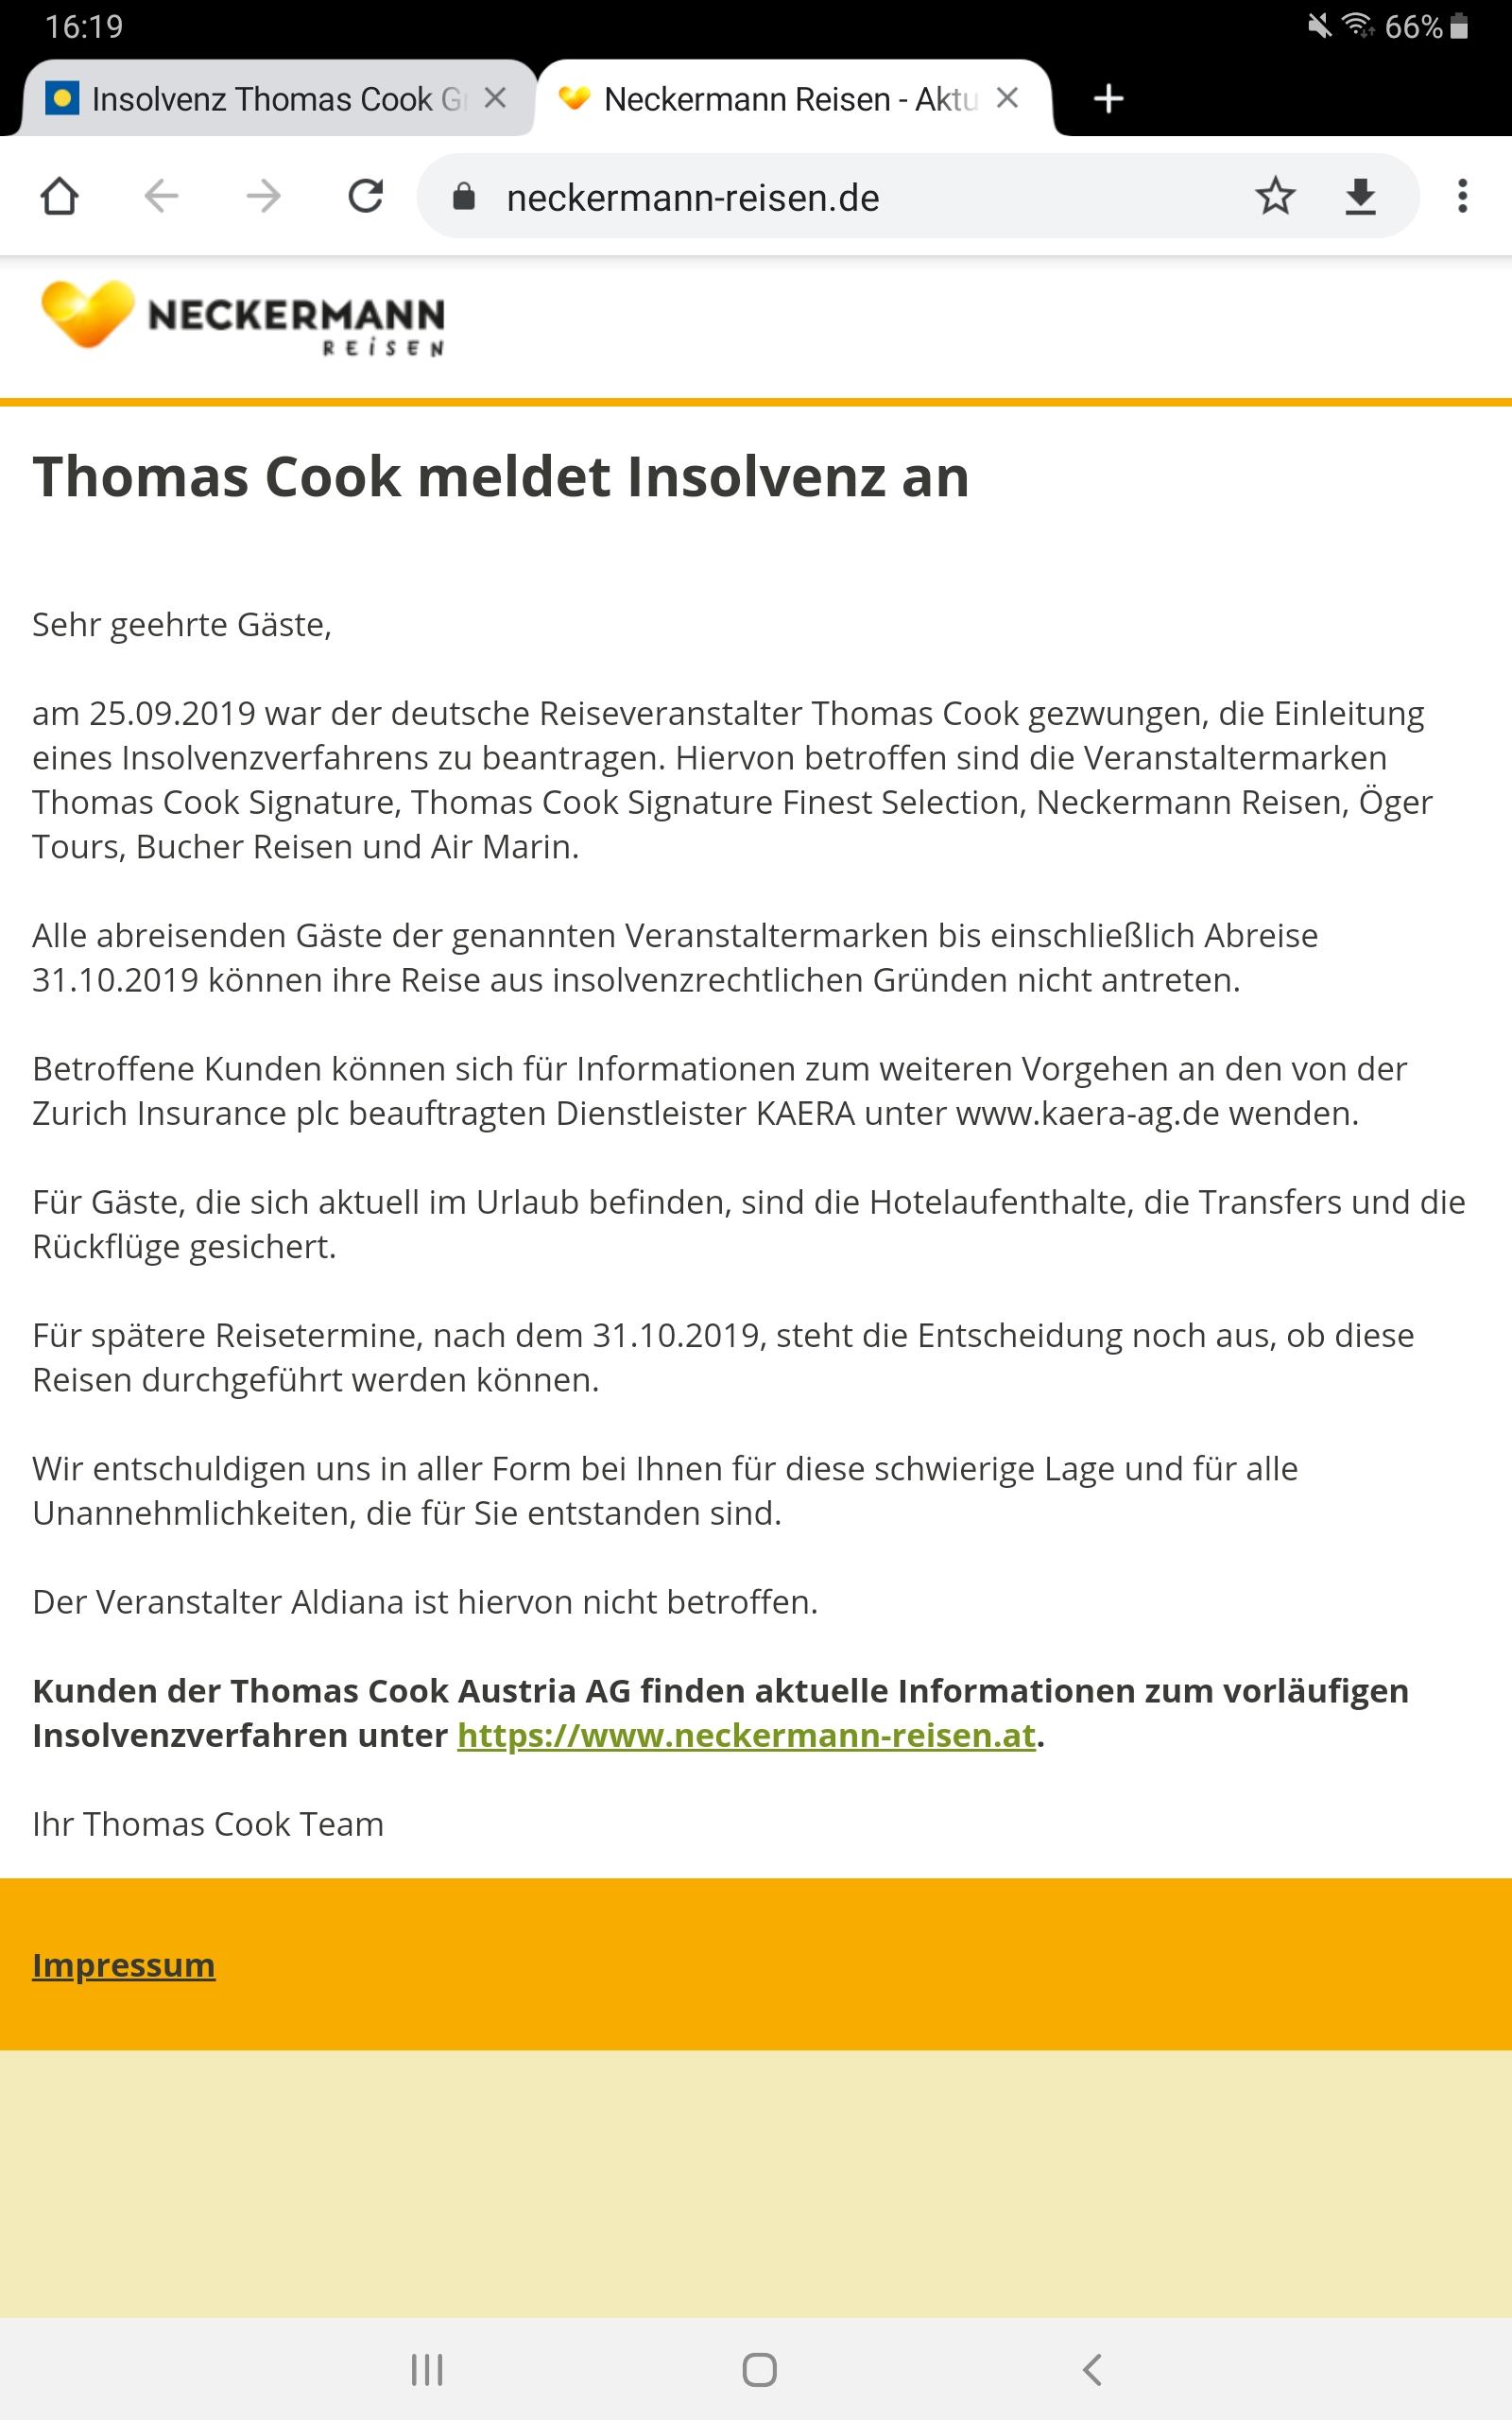 Insolvenz Thomas Cook Gruppe (Neckermann, Öger Tours, Bucher